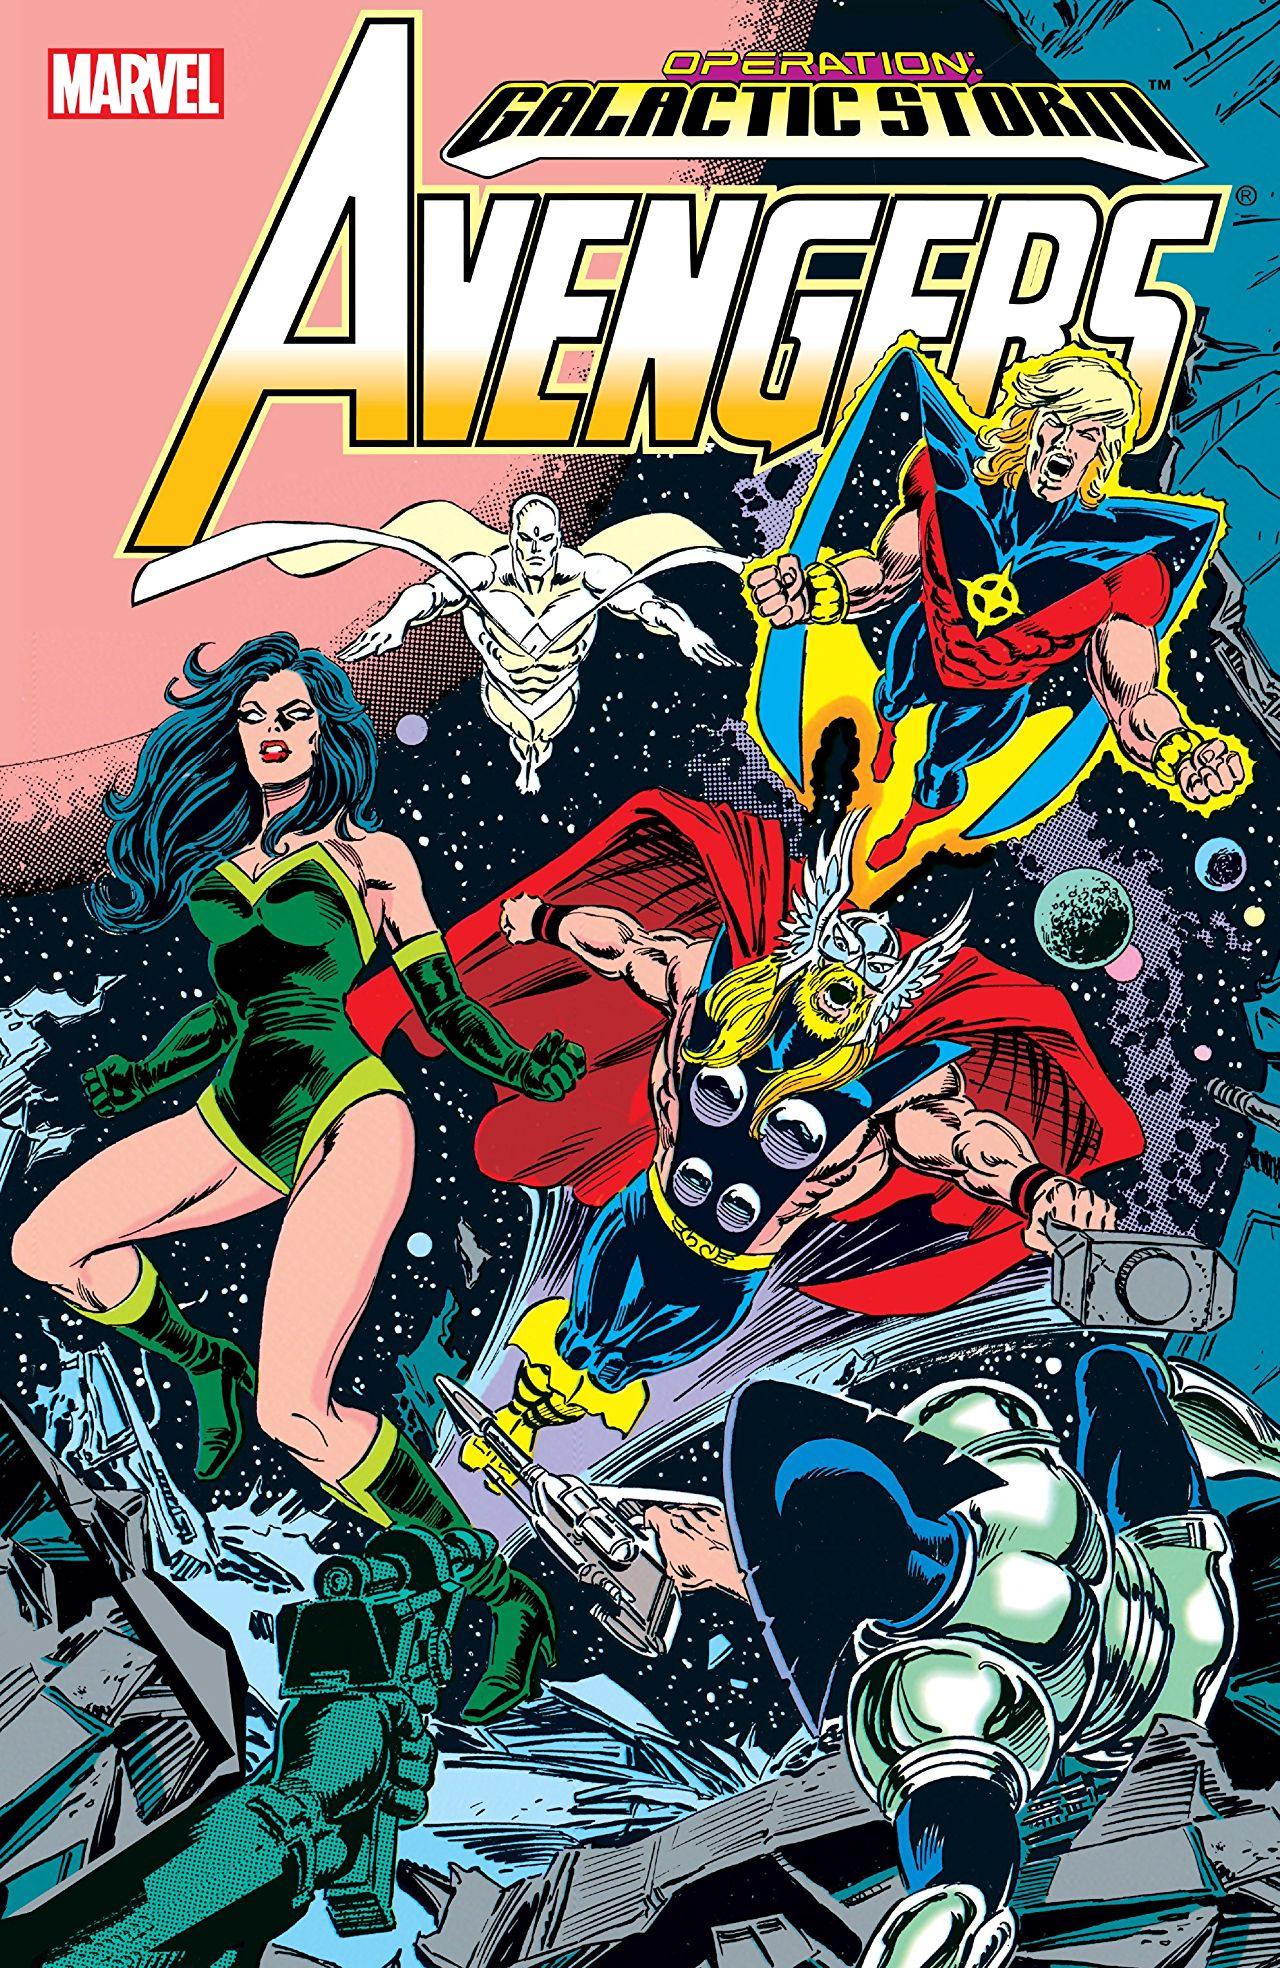 Avengers: Galactic Storm Vol 1 1